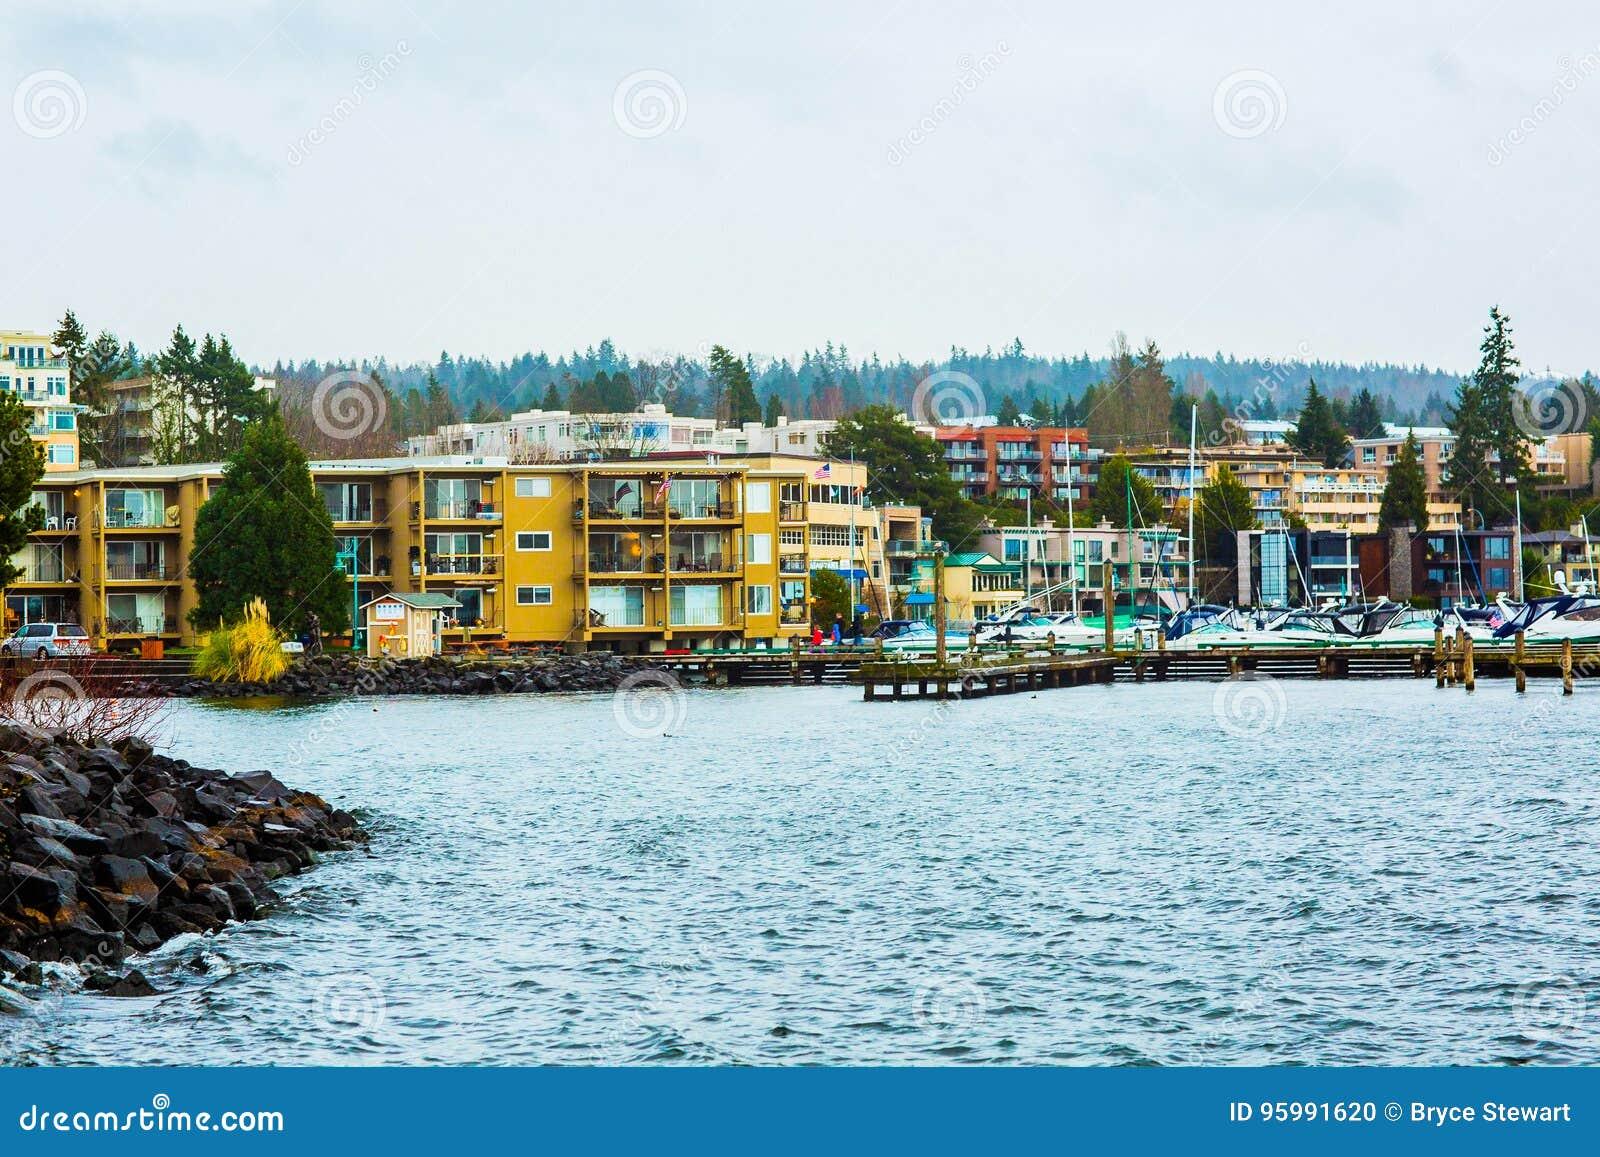 Océano Pacífico Mt de Puget Sound Seattle Washington State Pacific Northwest PNW Árboles de pino de Rainer Mountains Trees Evergr